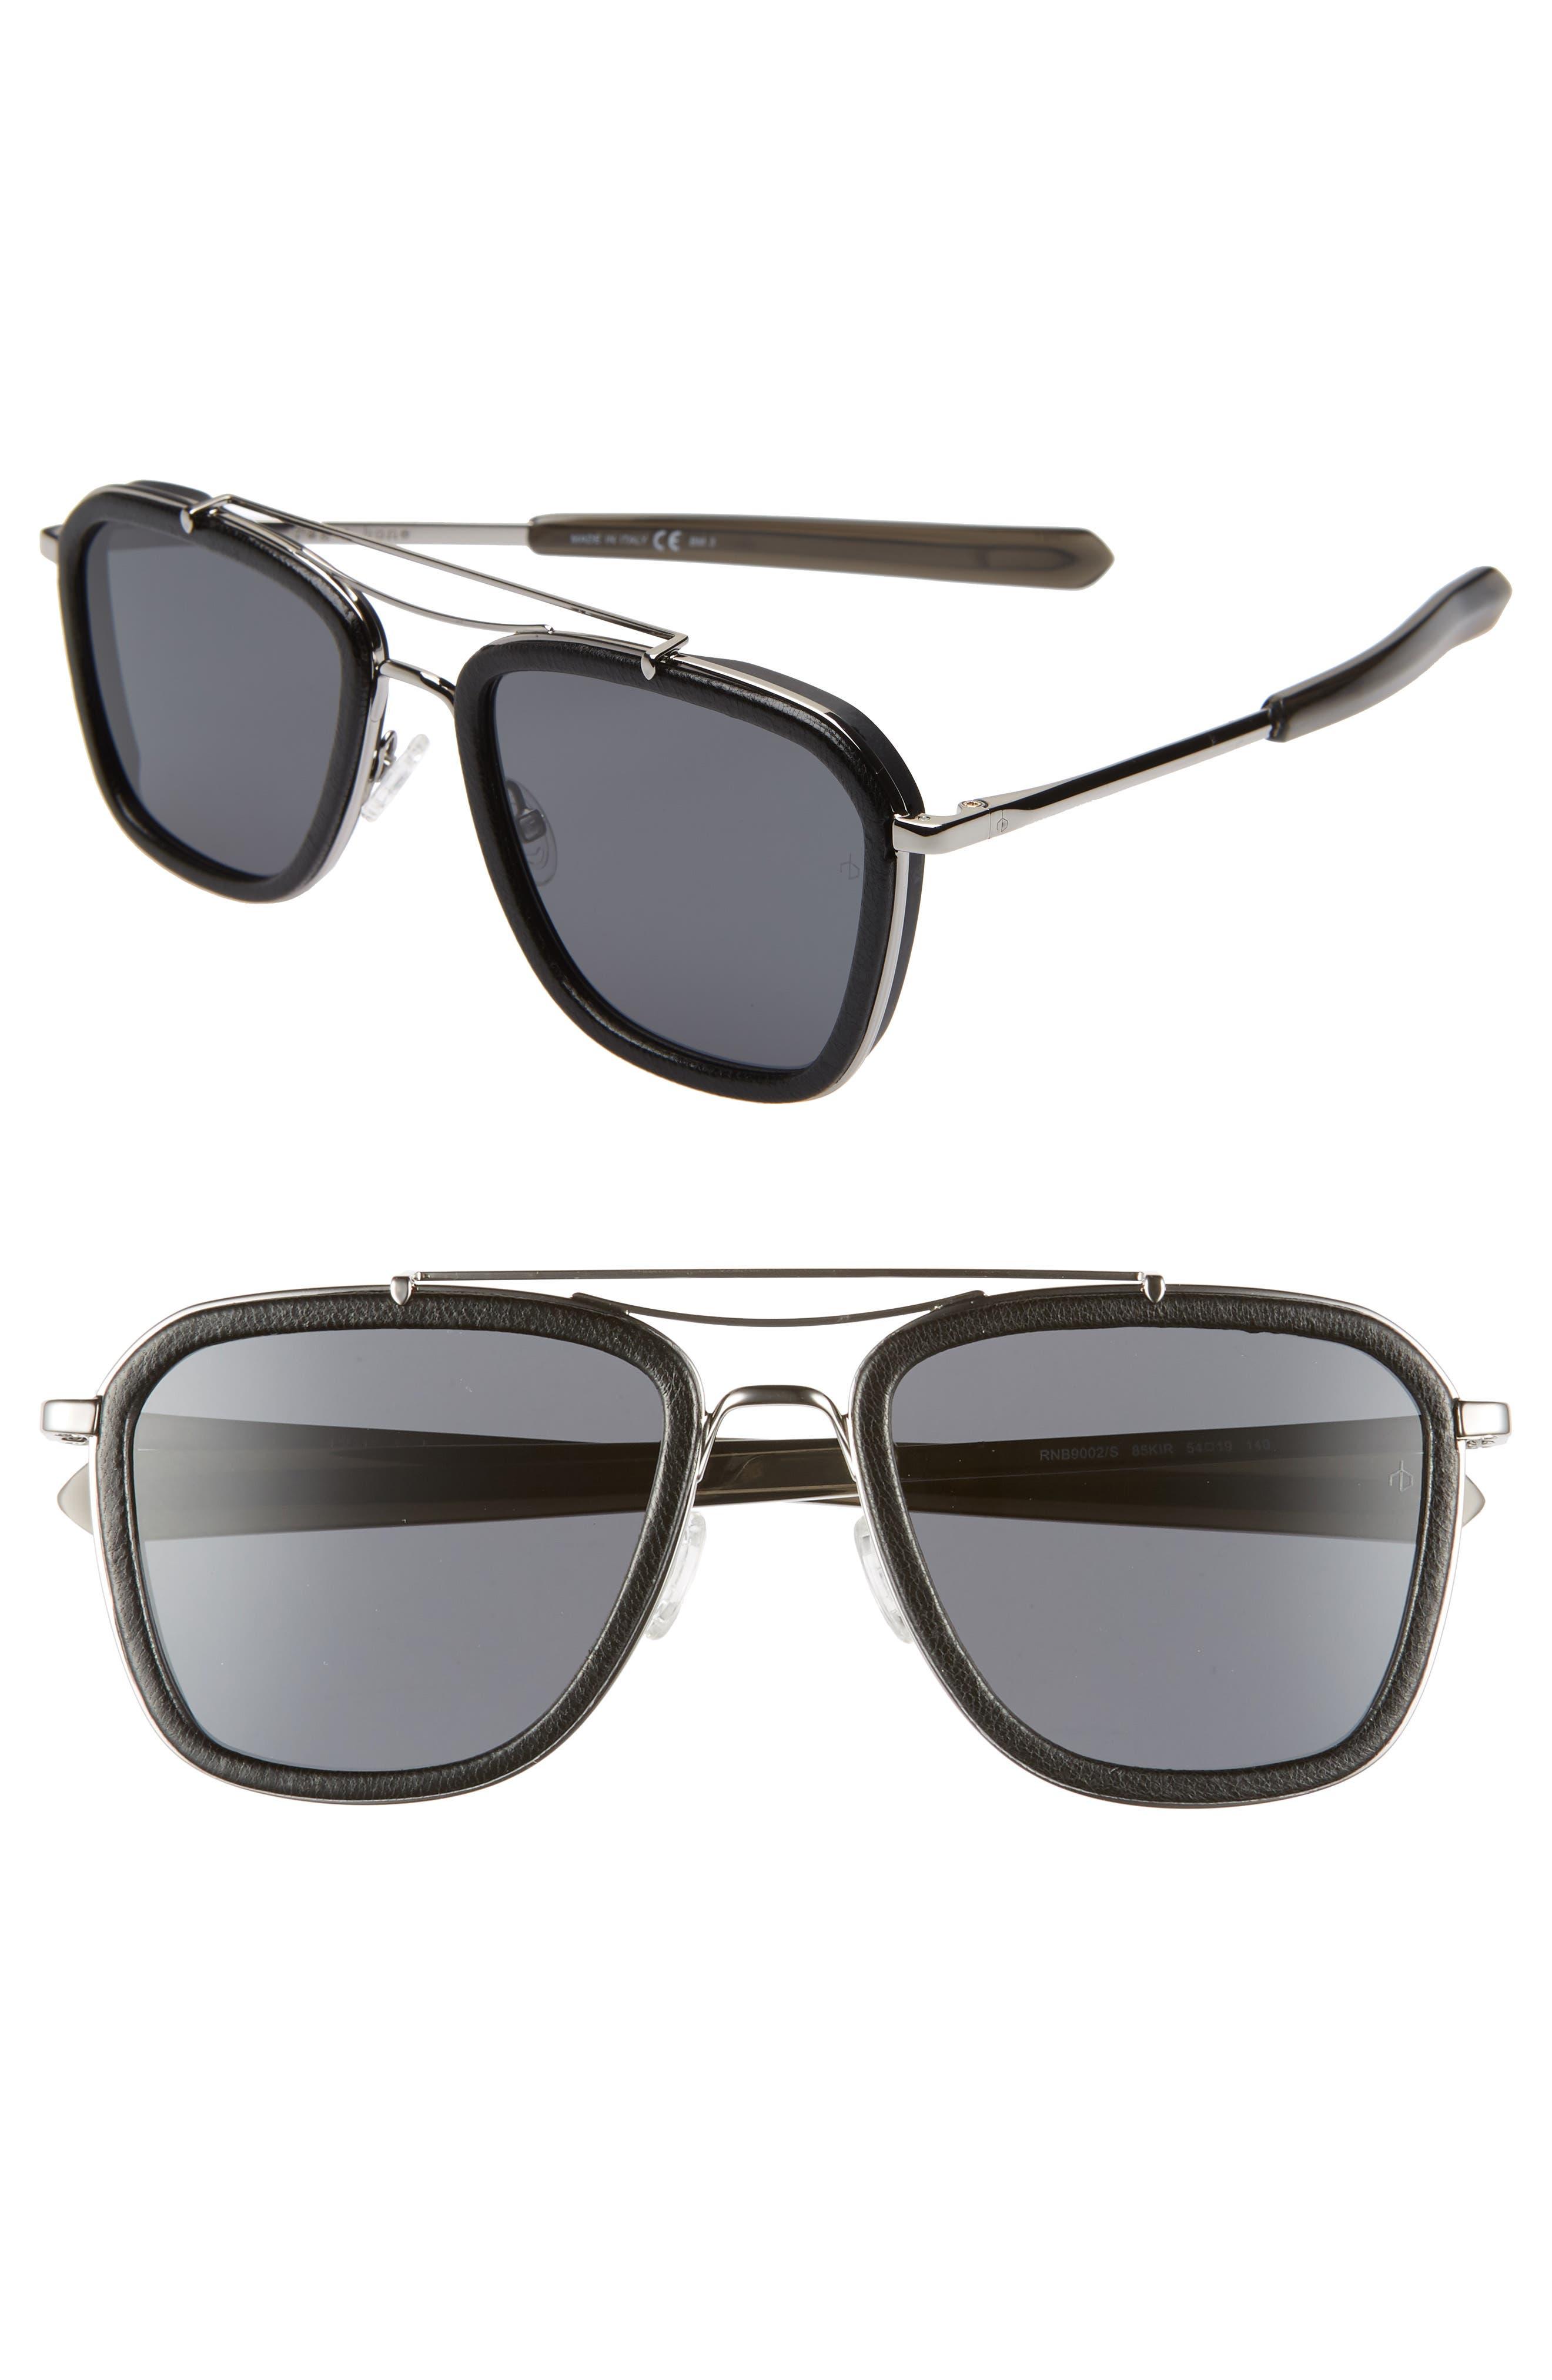 Phantom 54mm Aviator Sunglasses,                             Main thumbnail 1, color,                             RUTHENIUM/ BLACK